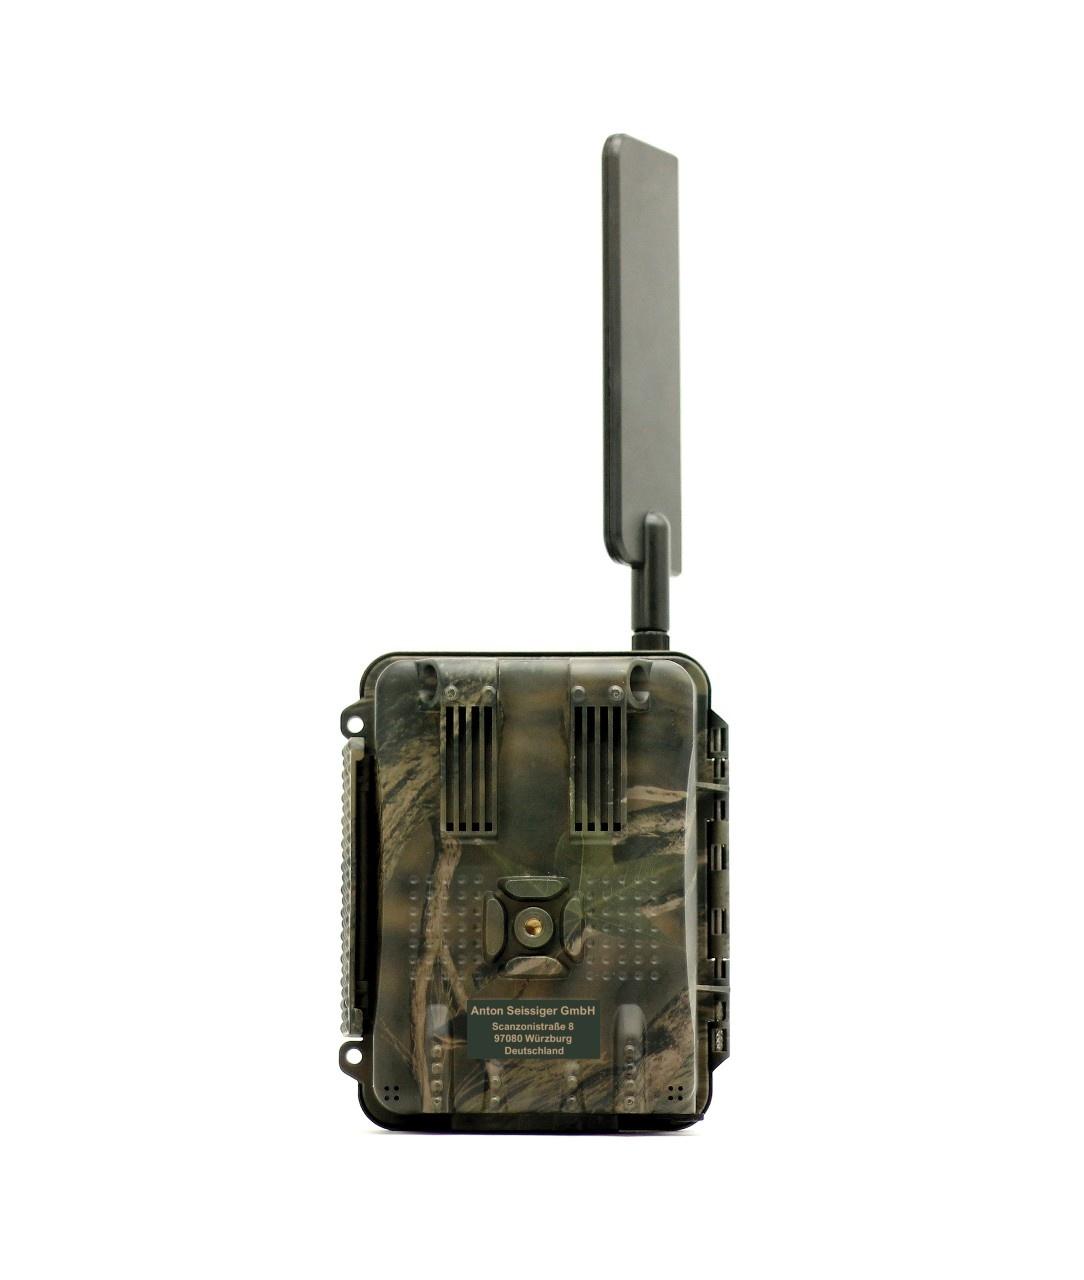 Seissiger Special-Cam LTE - SUPERSIM-Edition-4